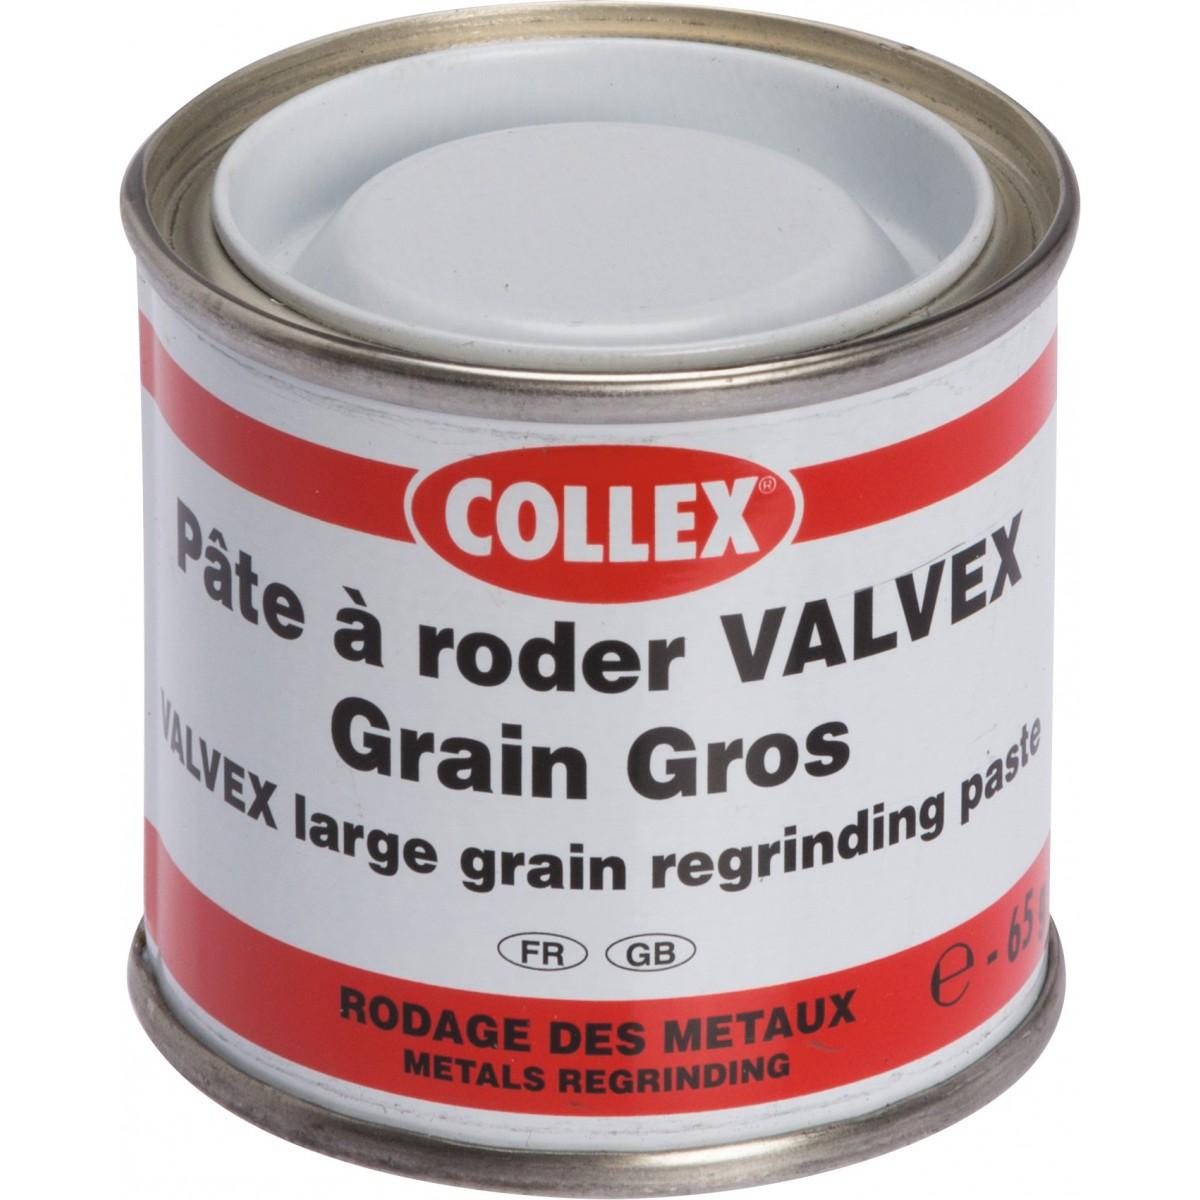 Pâte à roder Valvex Geb - Boîte de 130 g